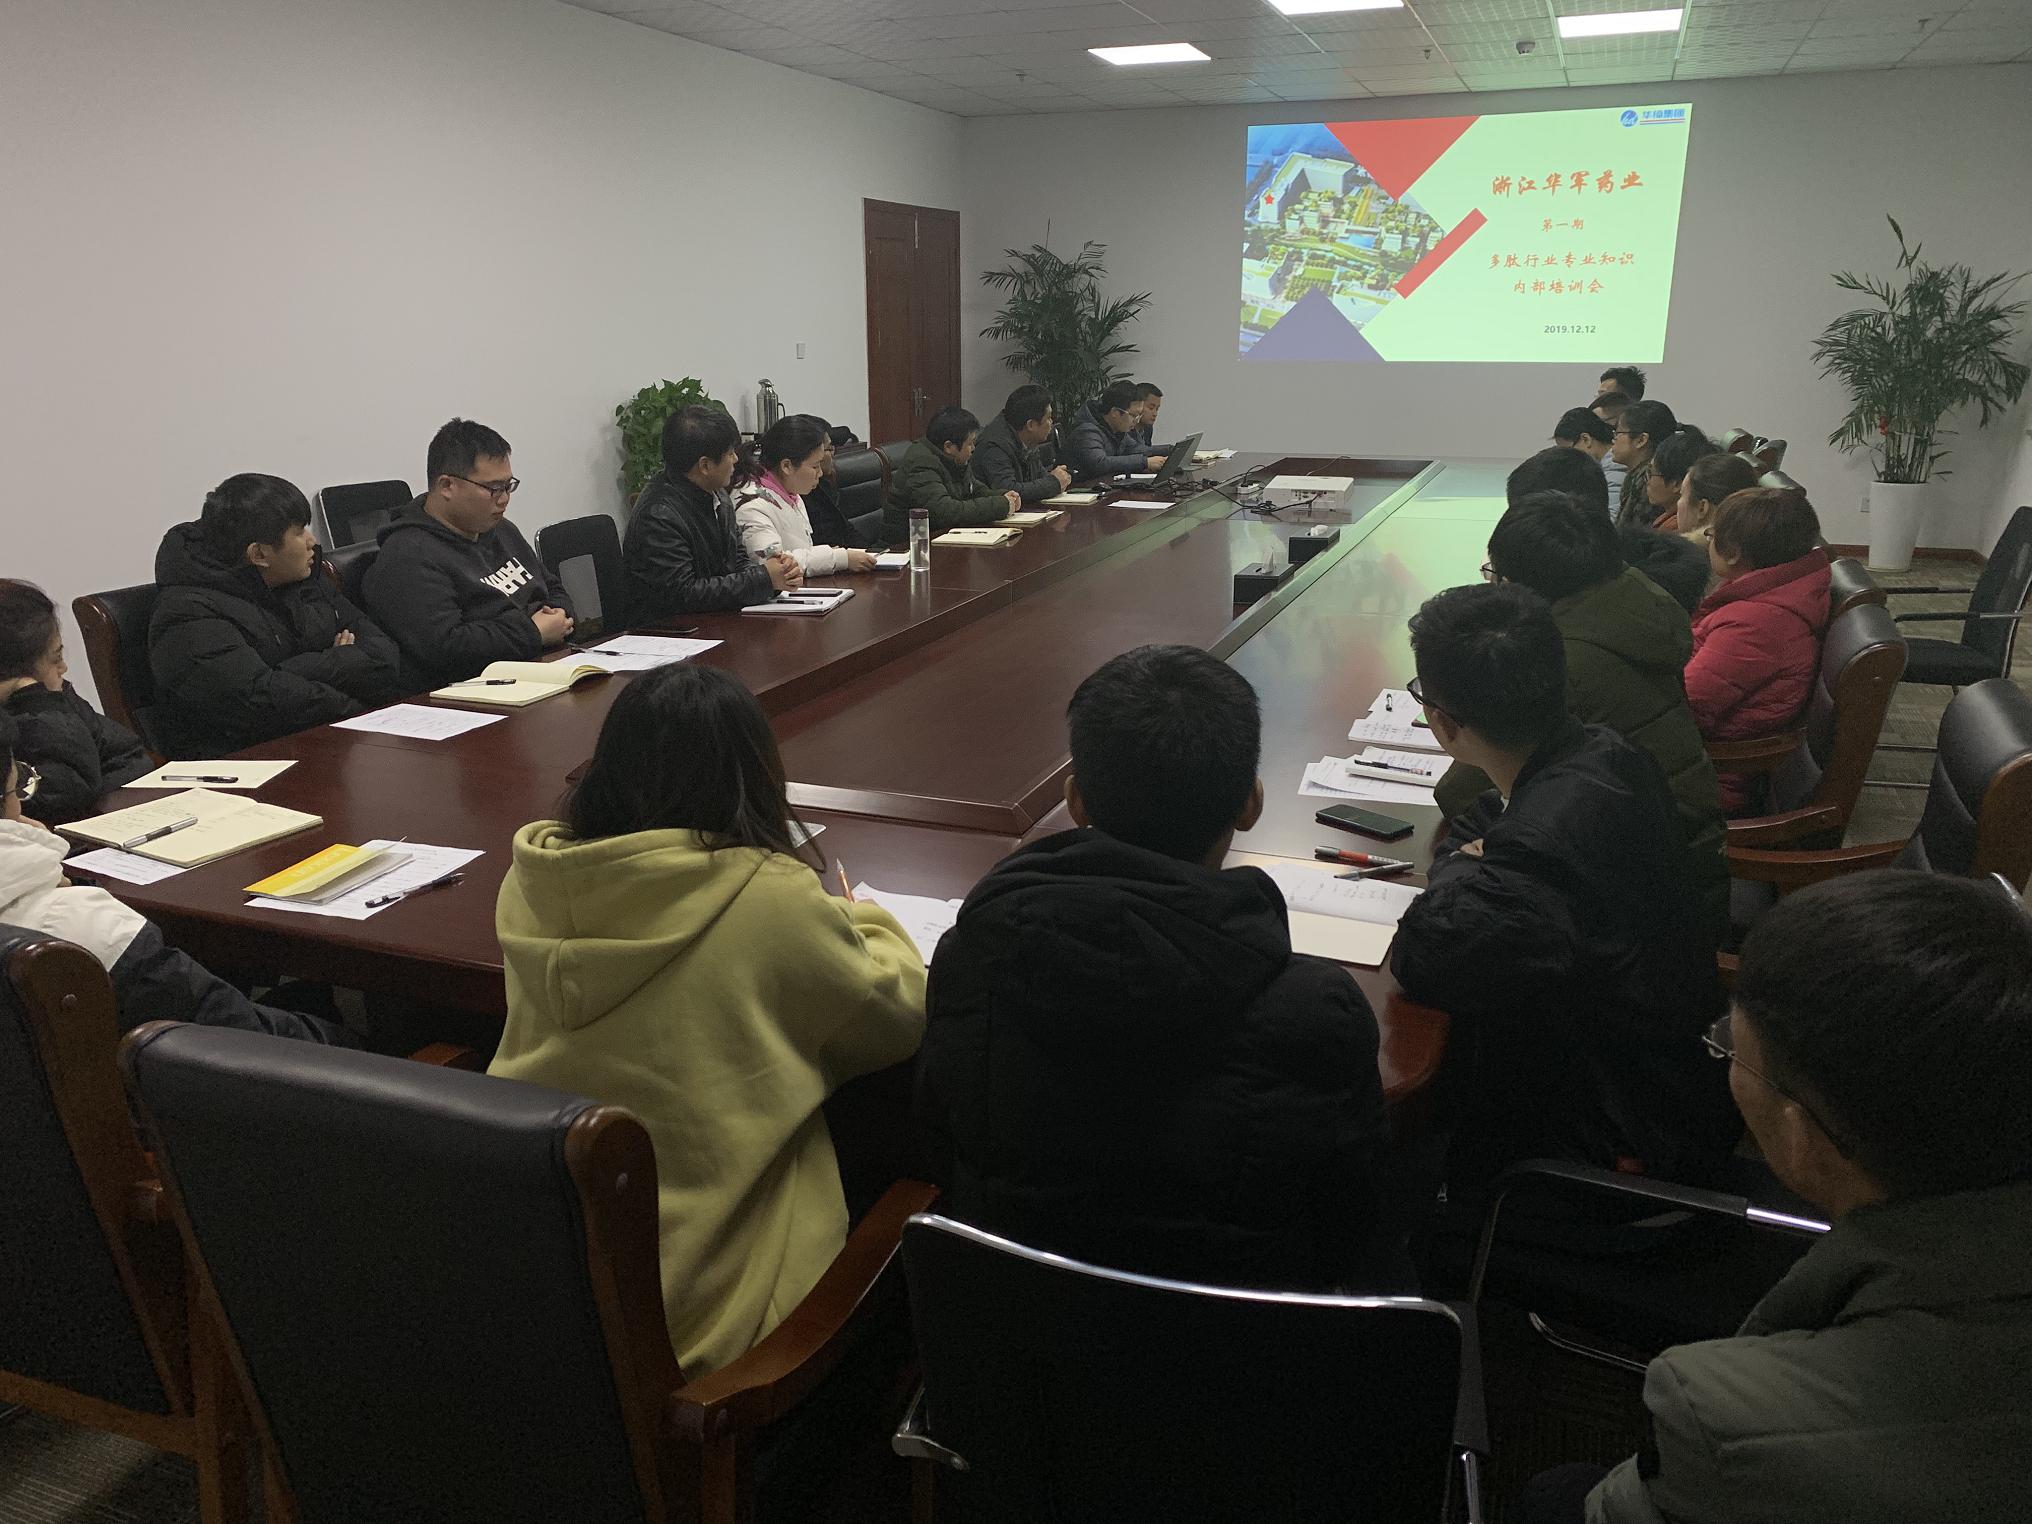 Zhejiang Huajun Pharmaceutical Co., Ltd. Held 'The First Internal Training Meeting on the Polypeptid